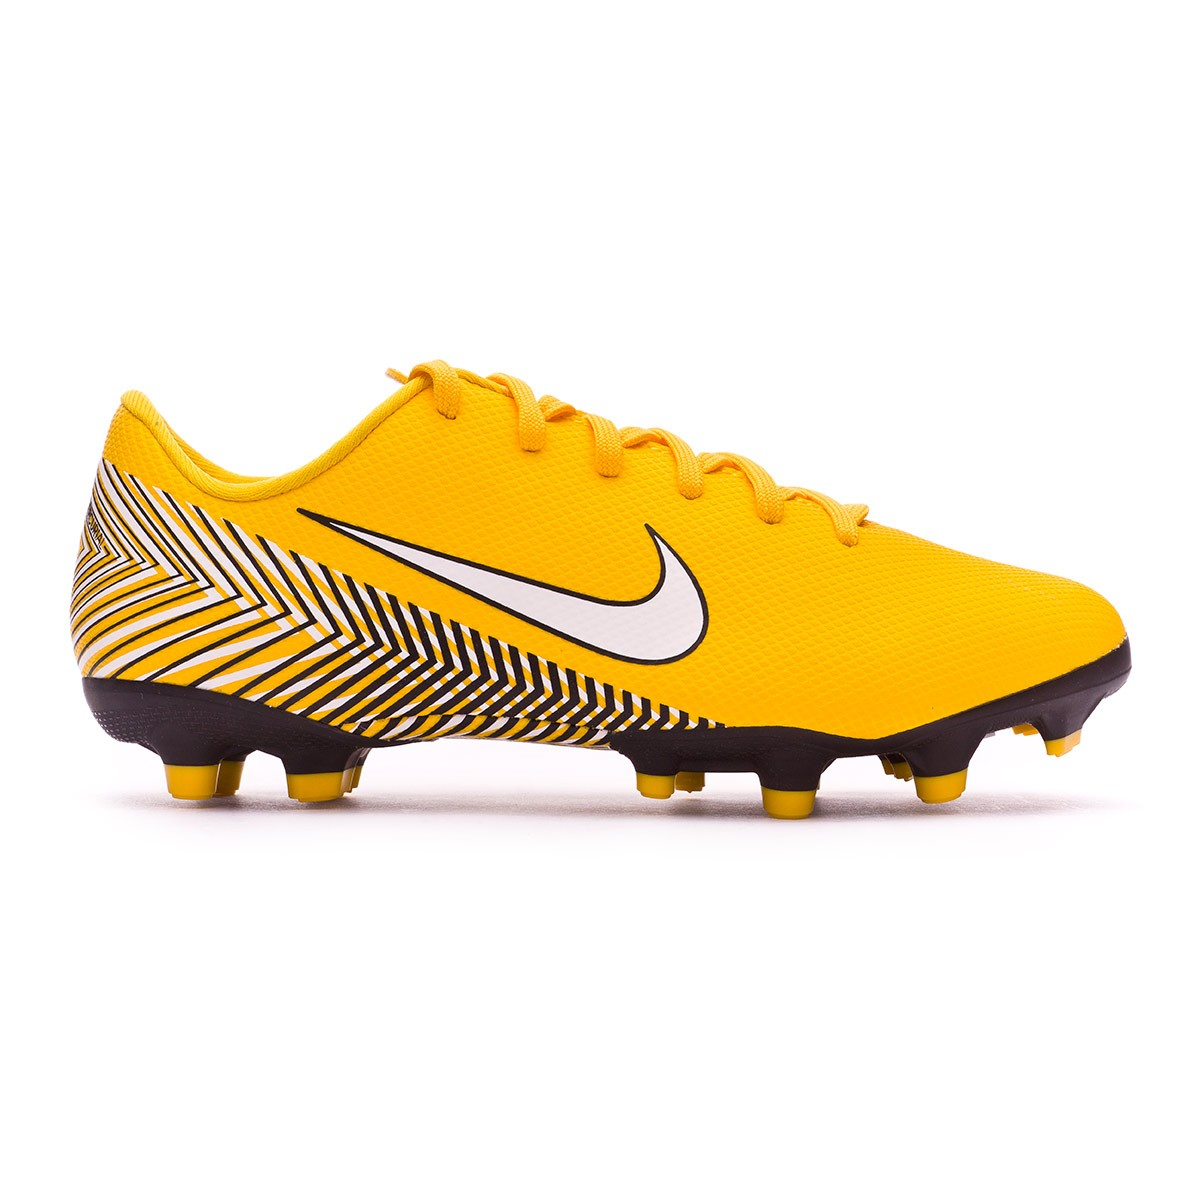 1208c437 Zapatos de fútbol Nike Mercurial Vapor XII Academy MG Neymar Niño  Yellow-Dinamic yellow-Black - Tienda de fútbol Fútbol Emotion